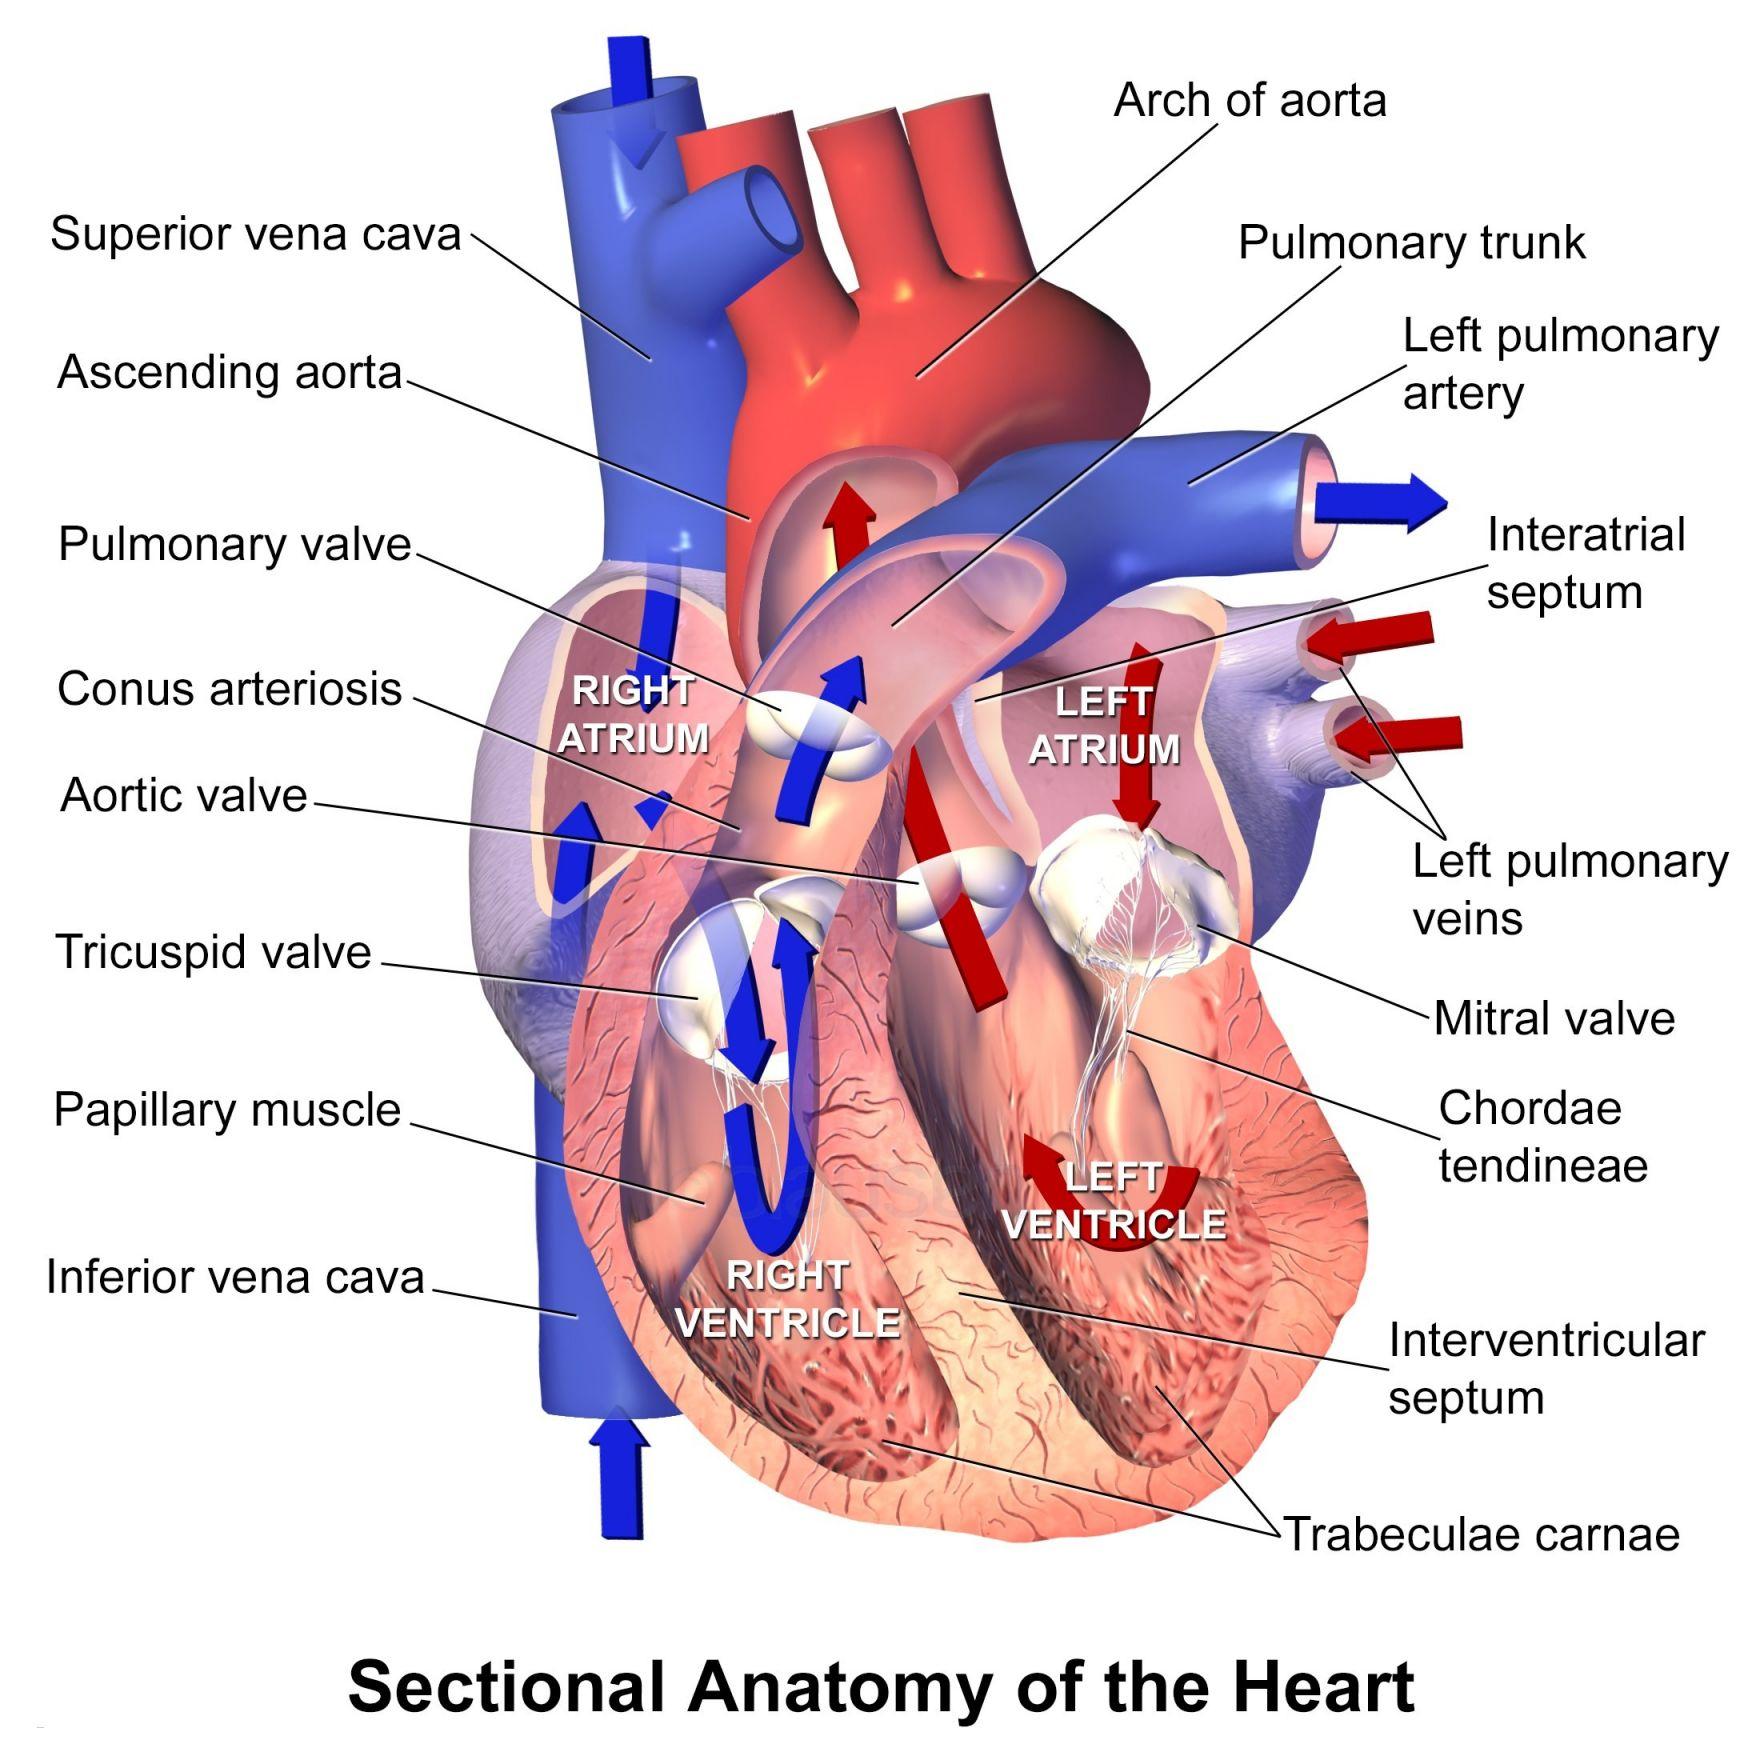 Heart Blood Flow Diagram Human Heart Blood Flow Diagram Lovely Lungs Diagram New Blood Flow